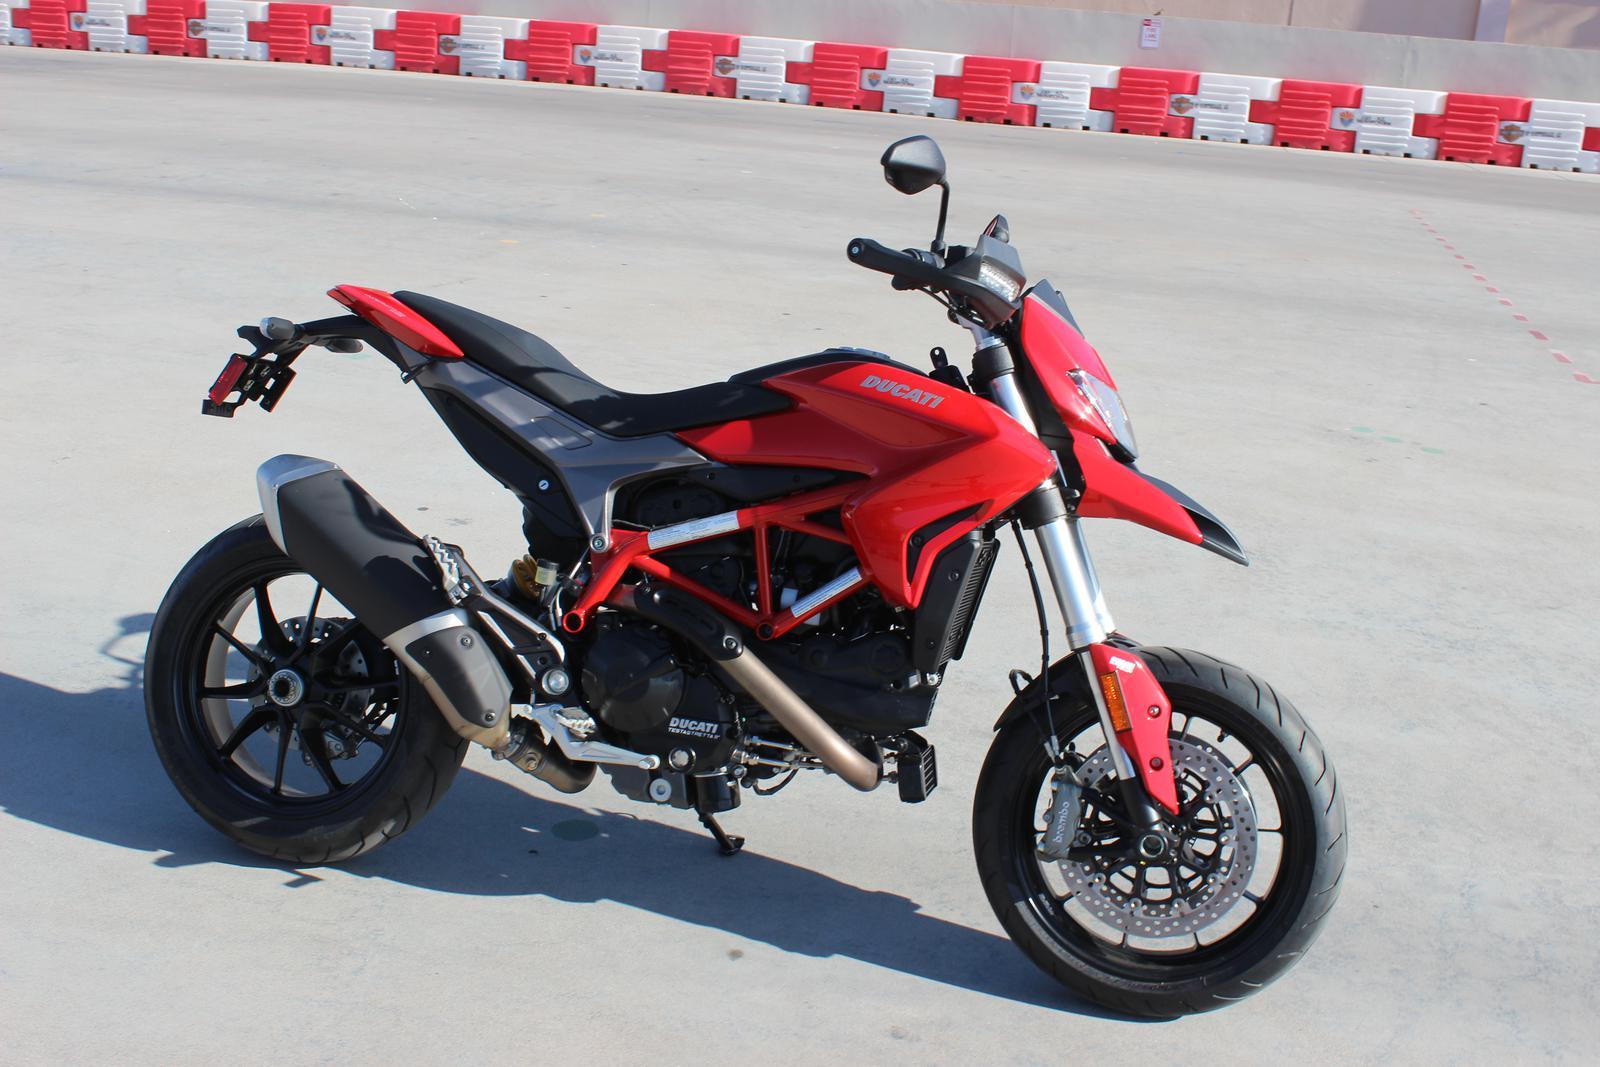 2018 Ducati Hypermotard 939 for sale in Scottsdale, AZ | GO AZ ...